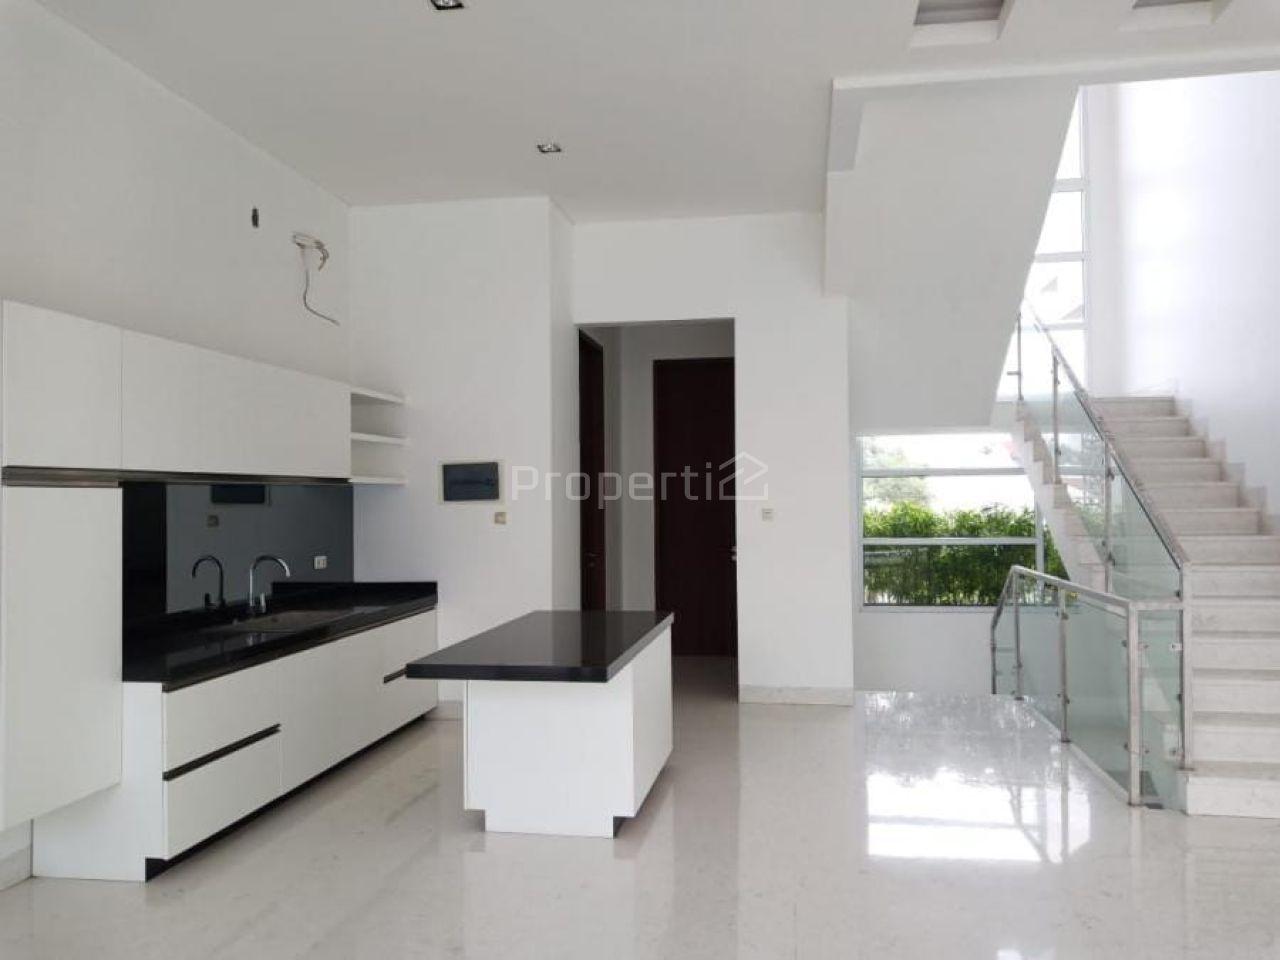 Luxury House with Swimming Pool in Permata Hijau, DKI Jakarta